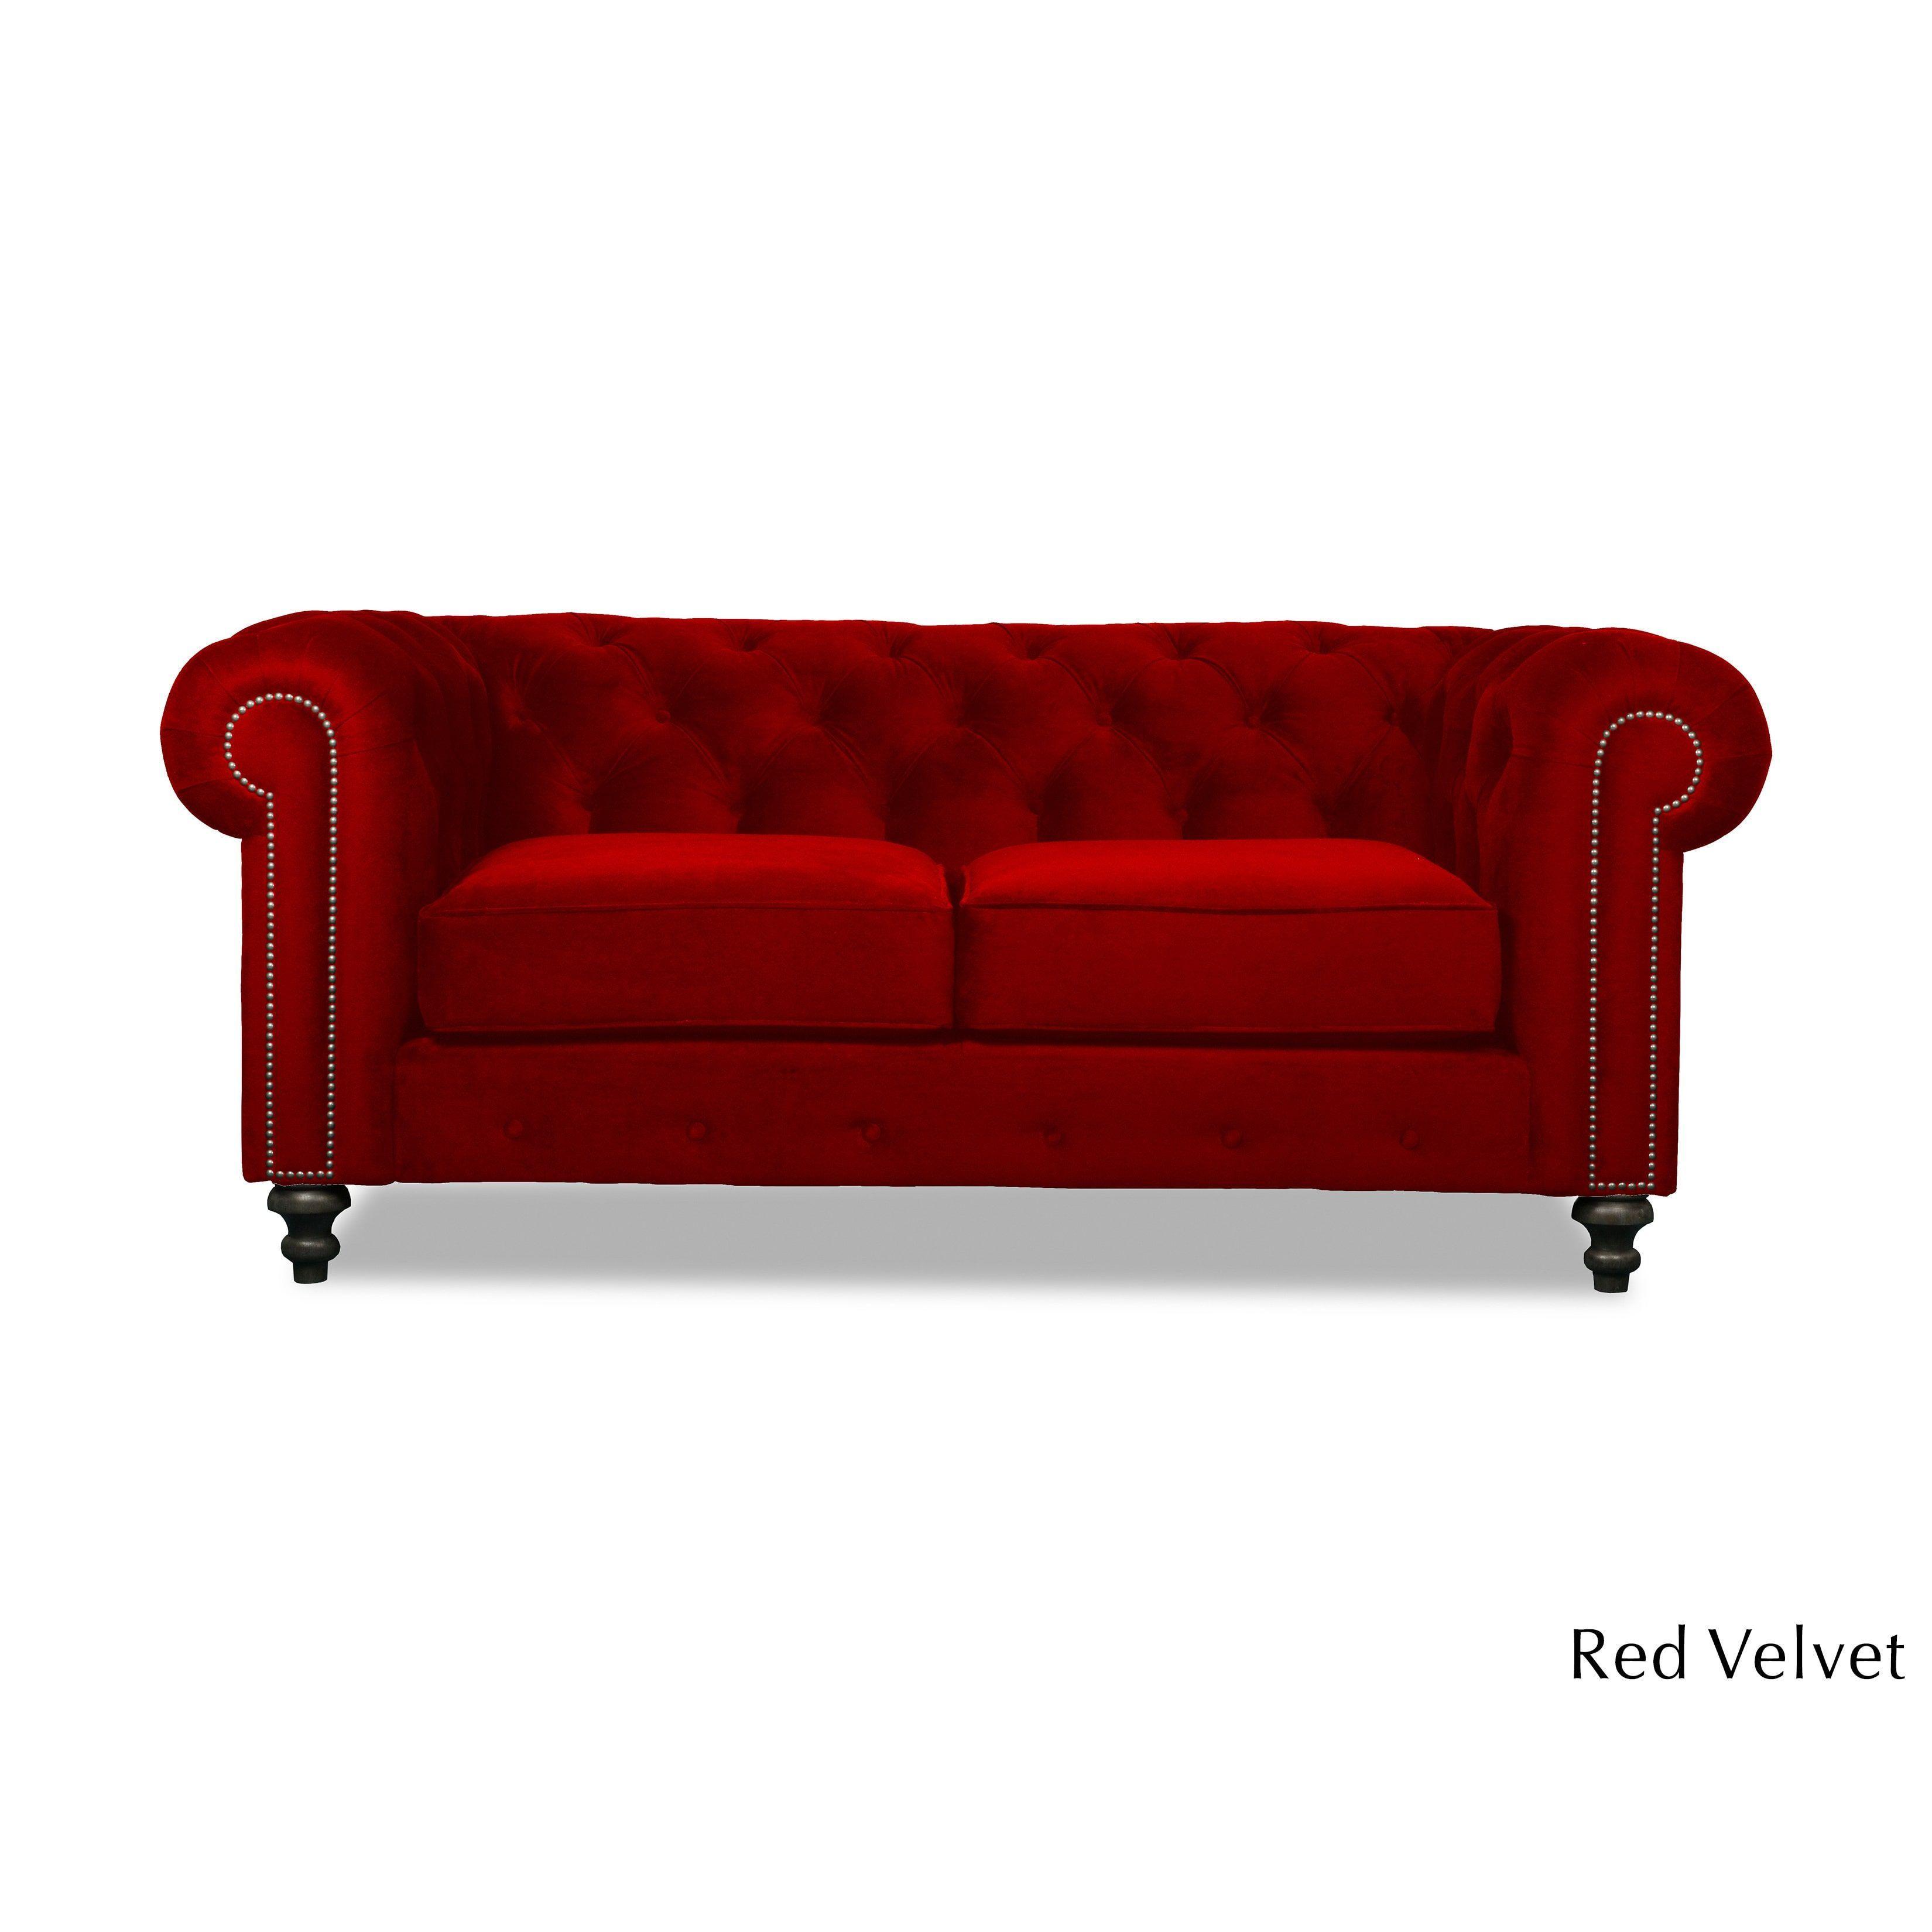 South Cone Home Patrick Chesterfield European Velvet Button Tufted Sofa